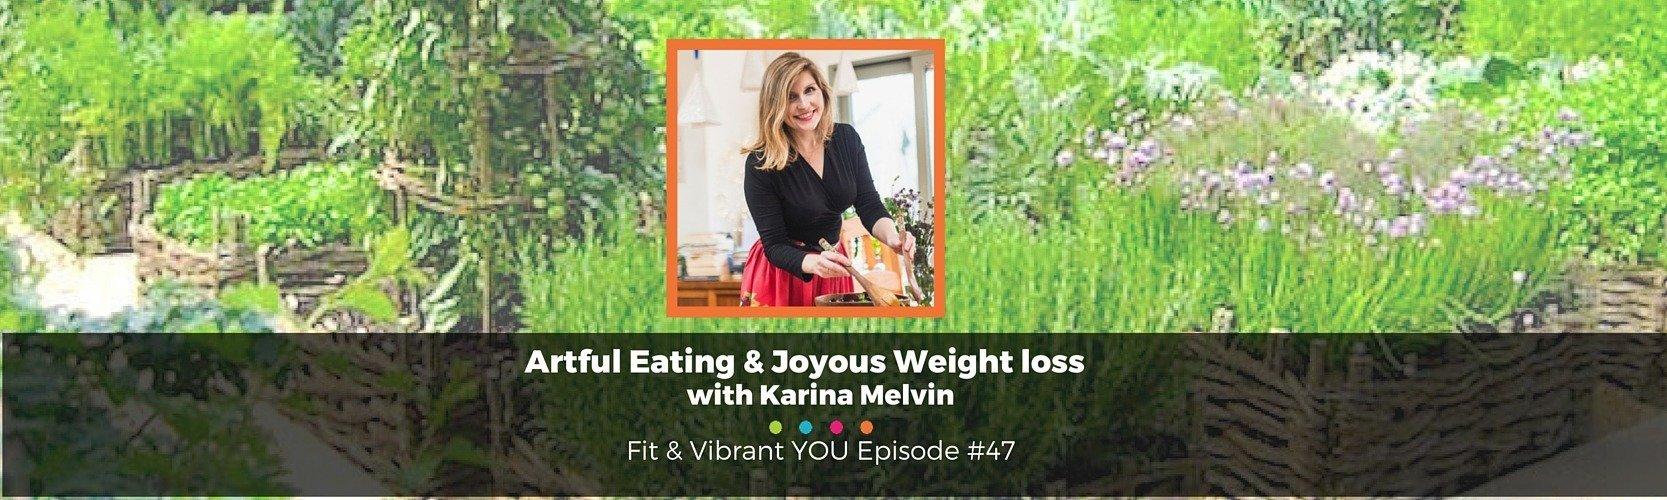 FVY 47: Artful Eating and Joyous Weight Loss with Karina Melvin